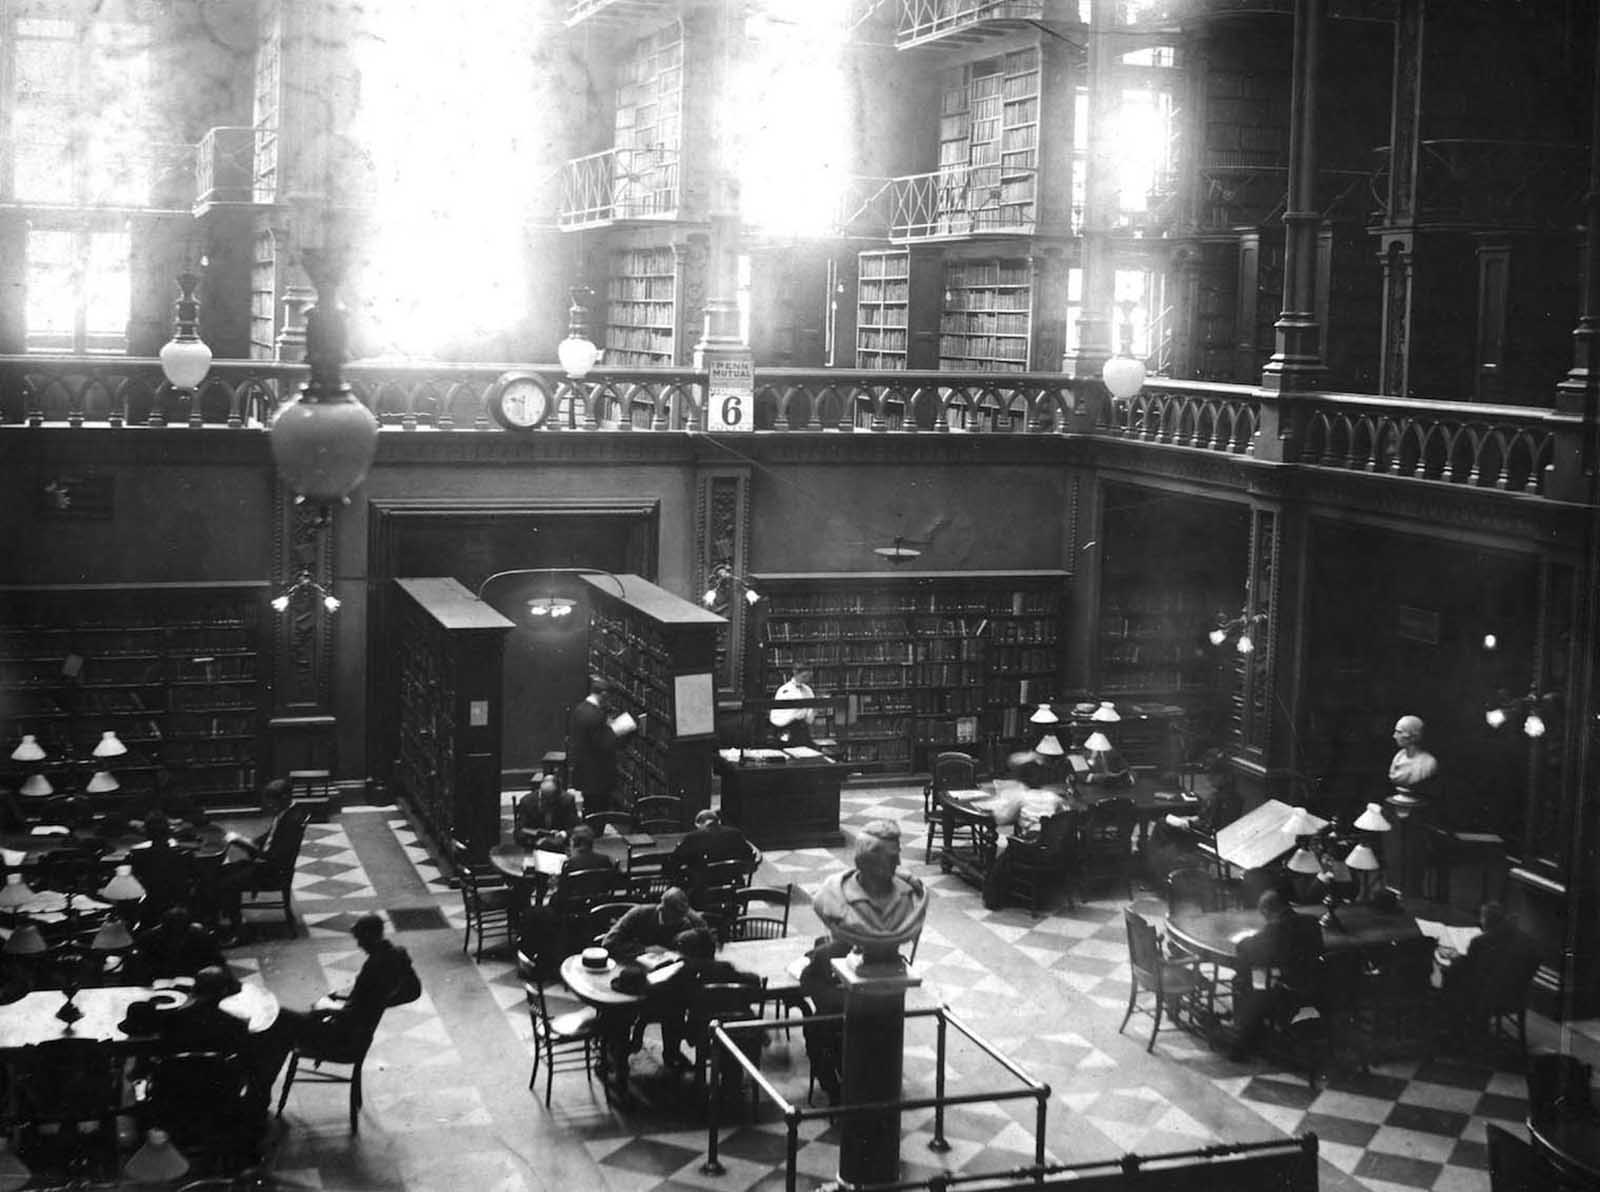 La vecchia Biblioteca Cincinnati prima di essere demolita, 1874-1955'Ancien Cincinnati Bibliothèque avant d'être démoli, 1874-1955